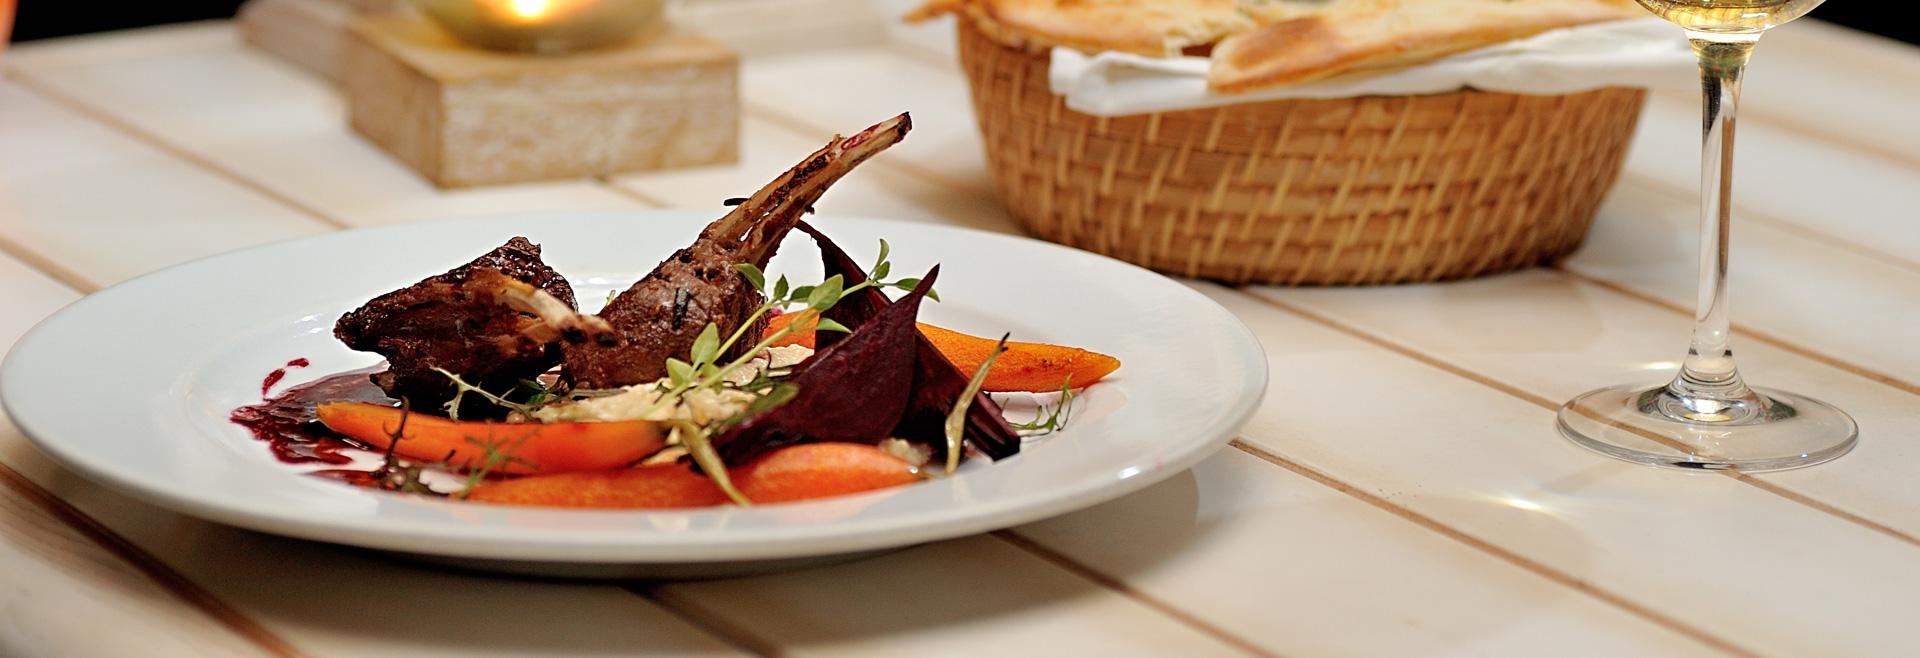 Dining at Driftwood Inn Hotel, California